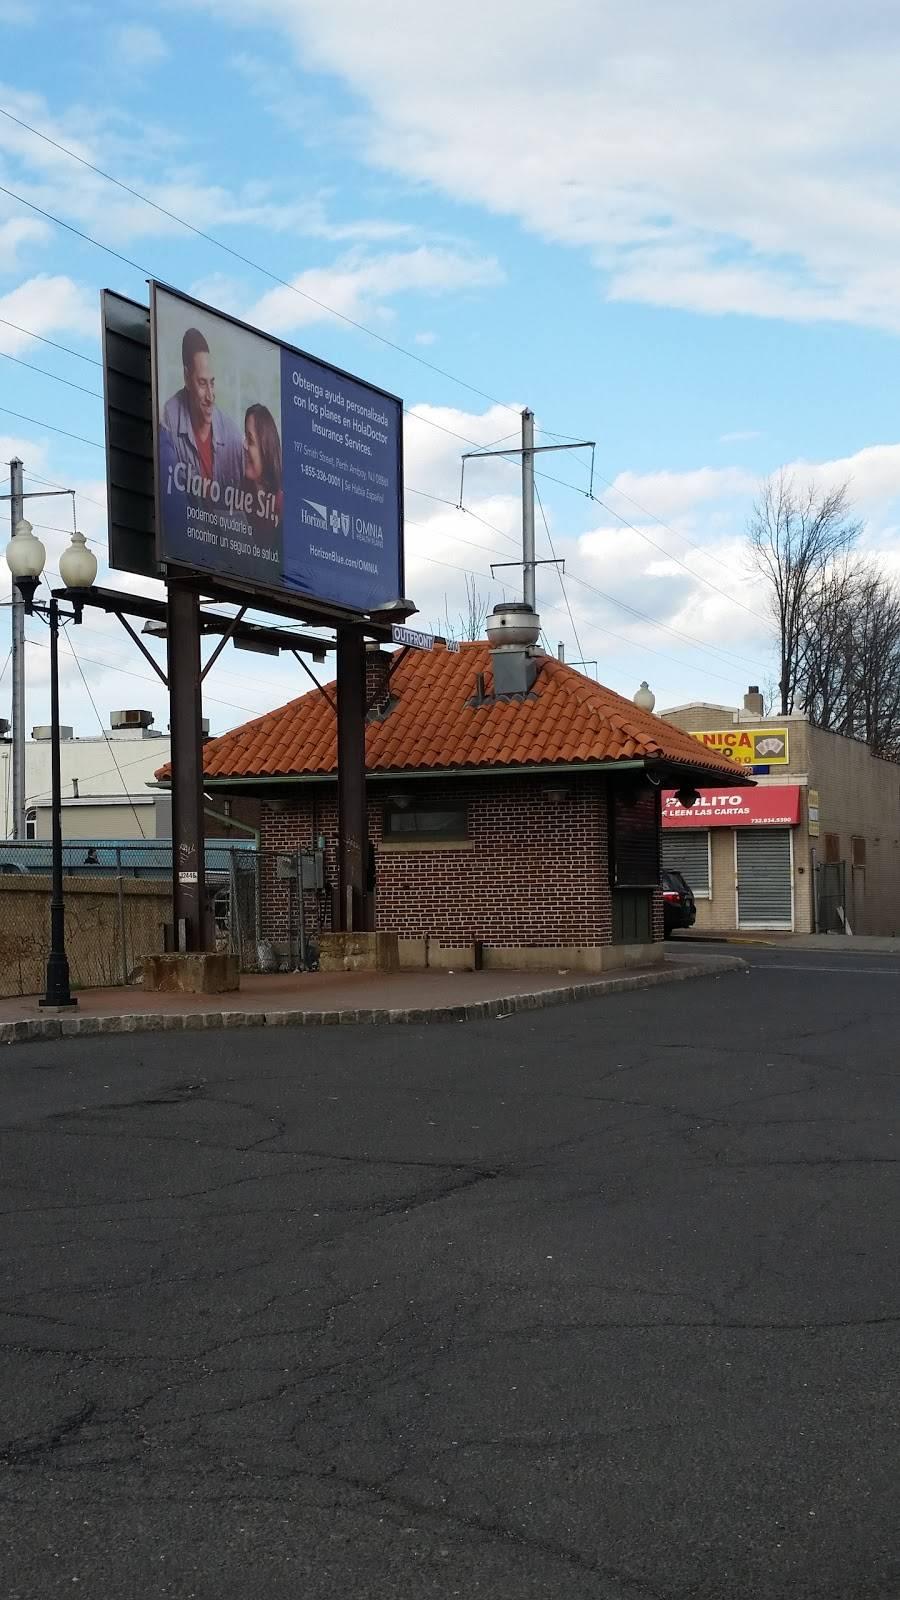 Costas Snack Bar aka The Burger Stand | restaurant | 249 Smith St, Perth Amboy, NJ 08861, USA